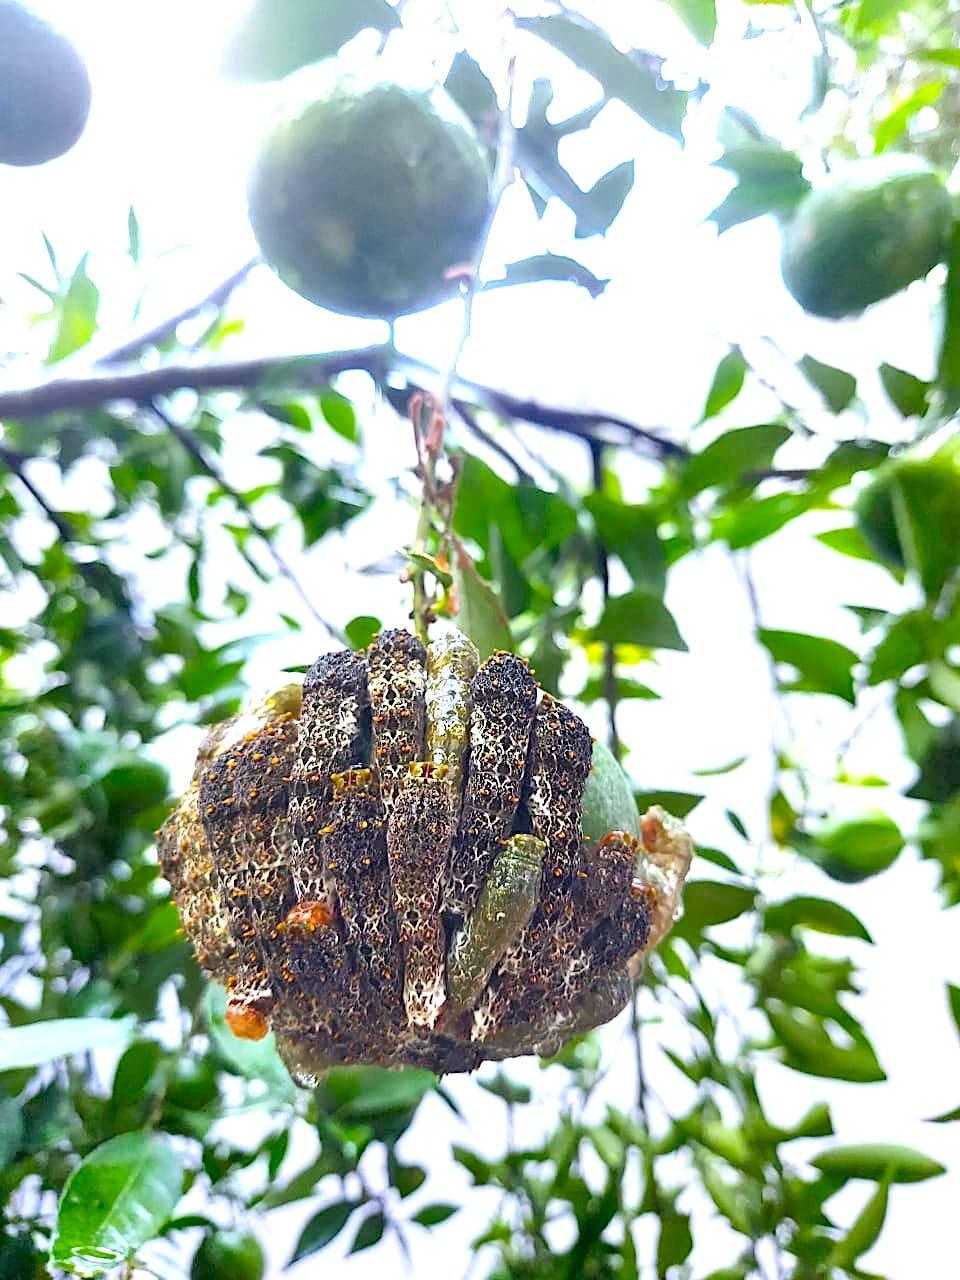 Lagarta-rosa-de-luto em bergamoteira, Teresópolis, Porto Alegre, RS / Ruby-spotted Swallowtail on tangerine